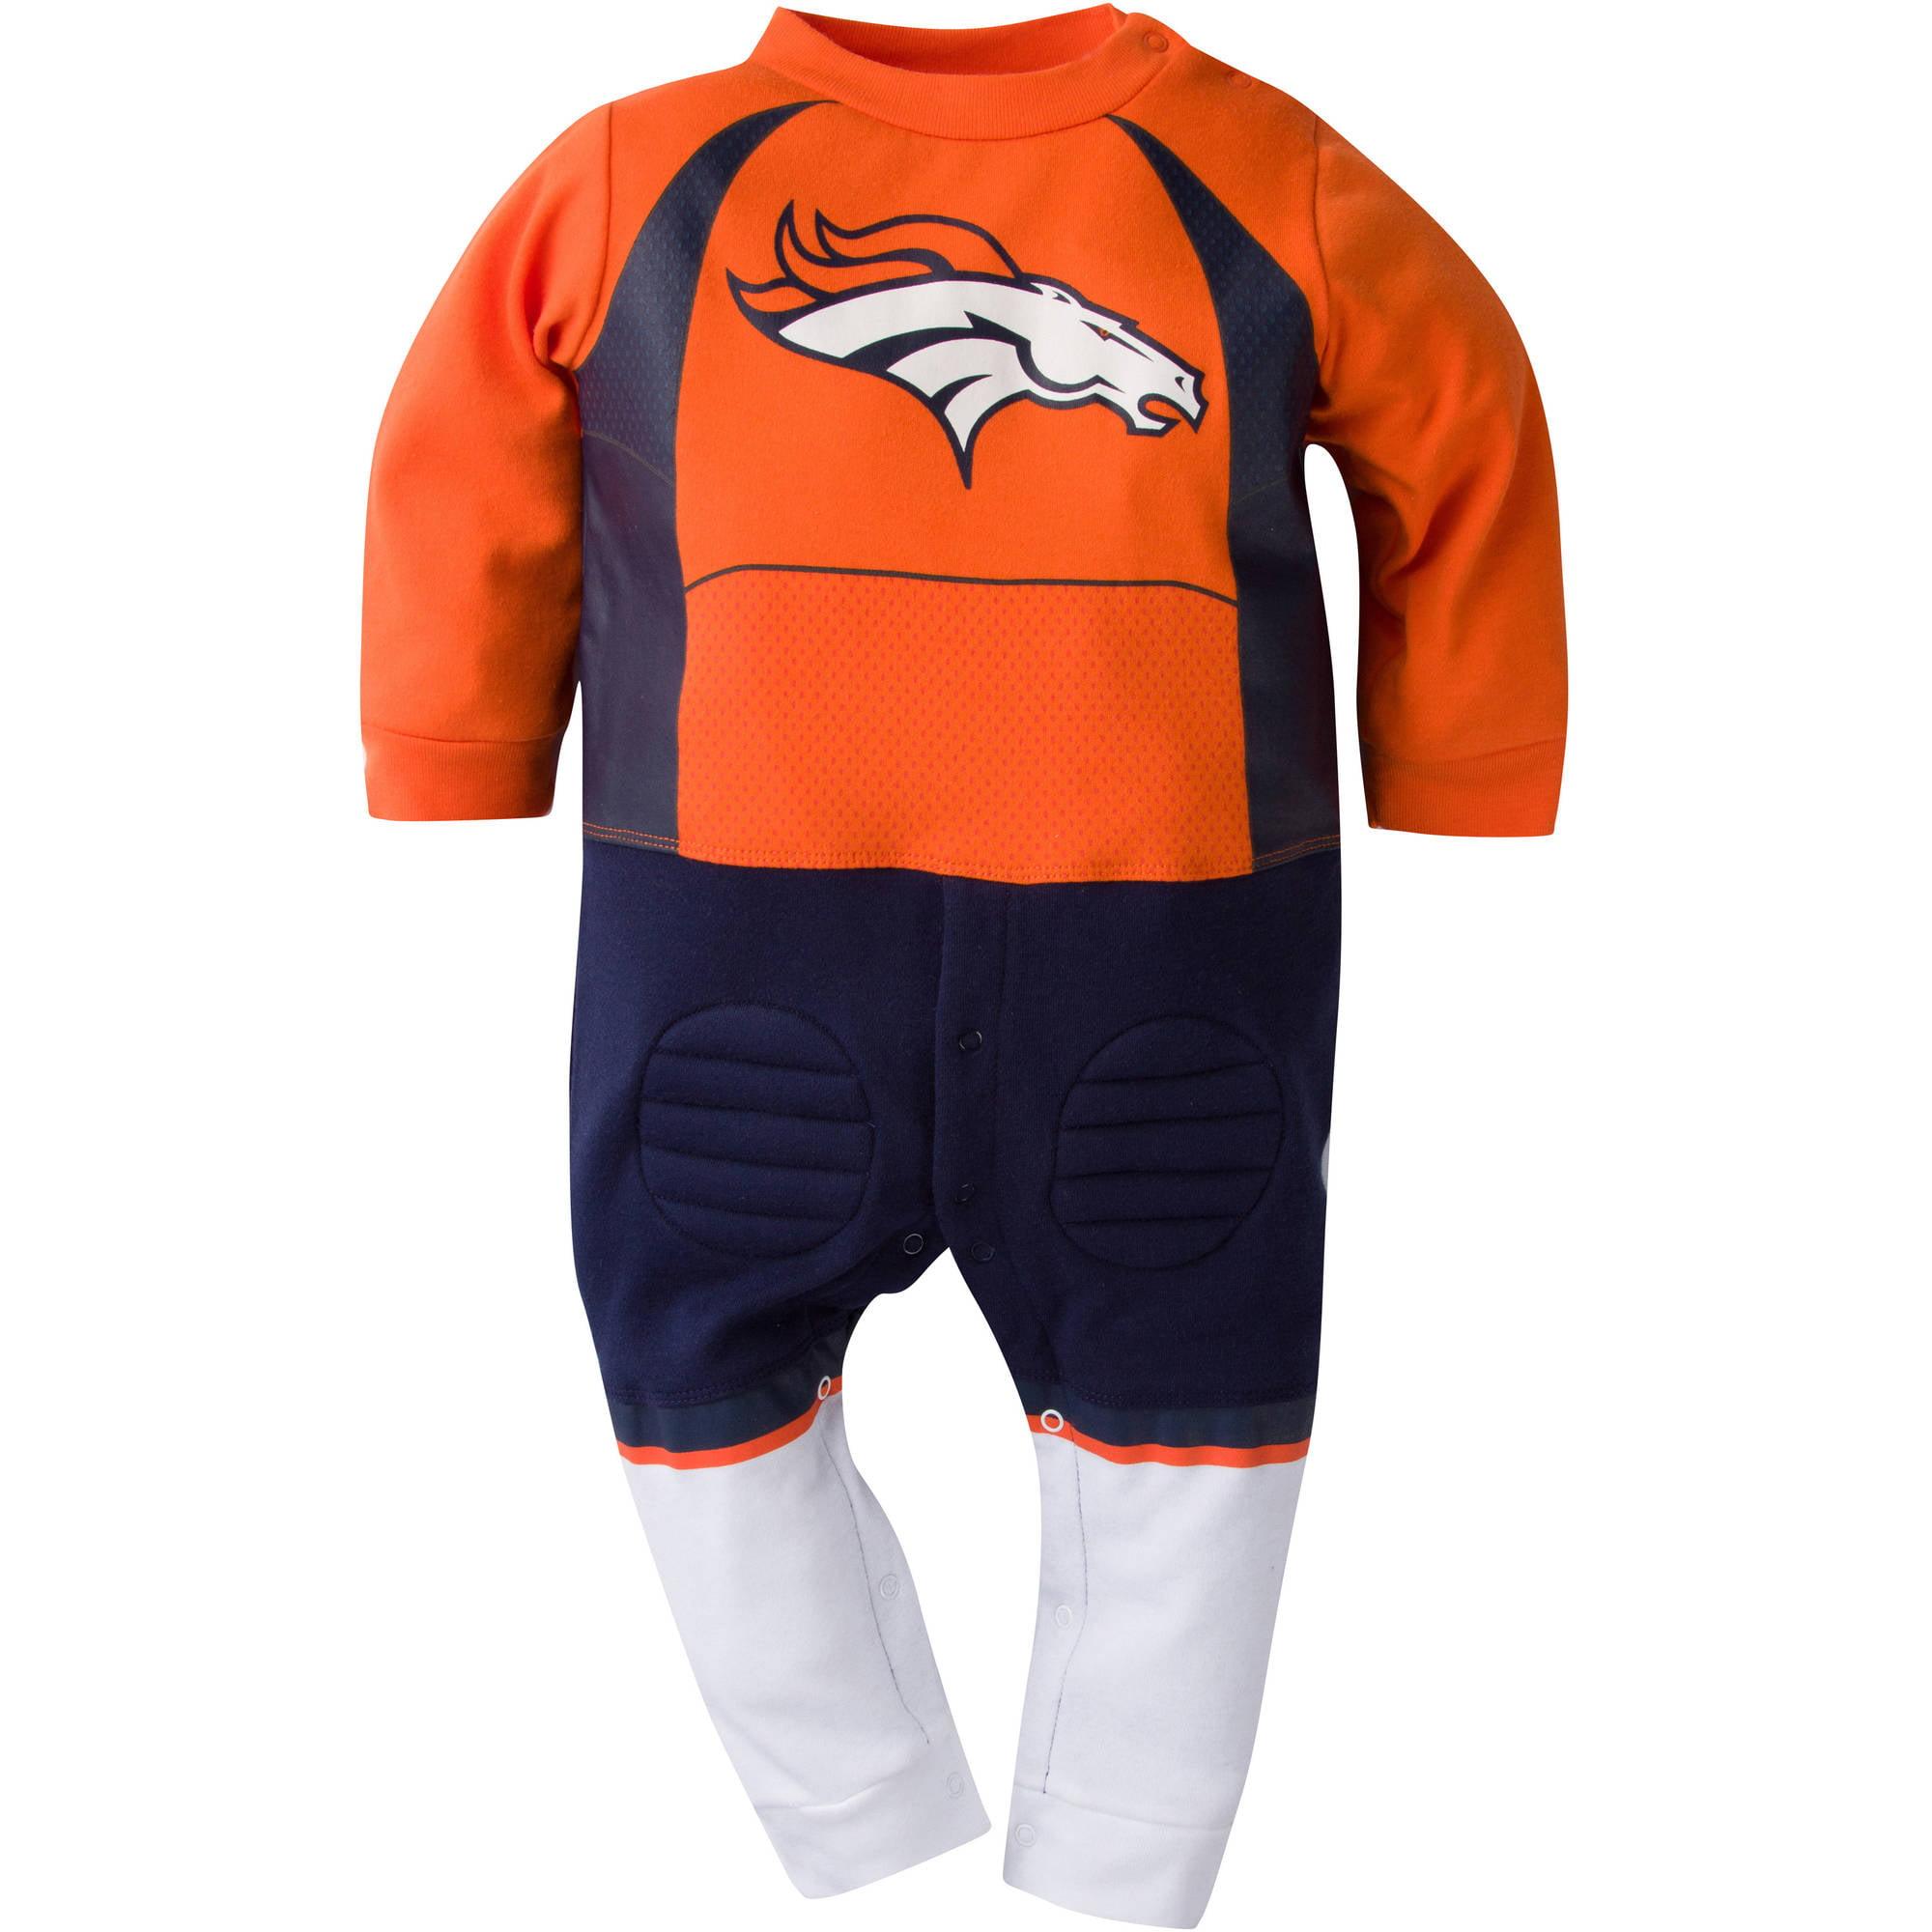 NFL Denver Broncos Baby Boys Team Uniform Footysuit